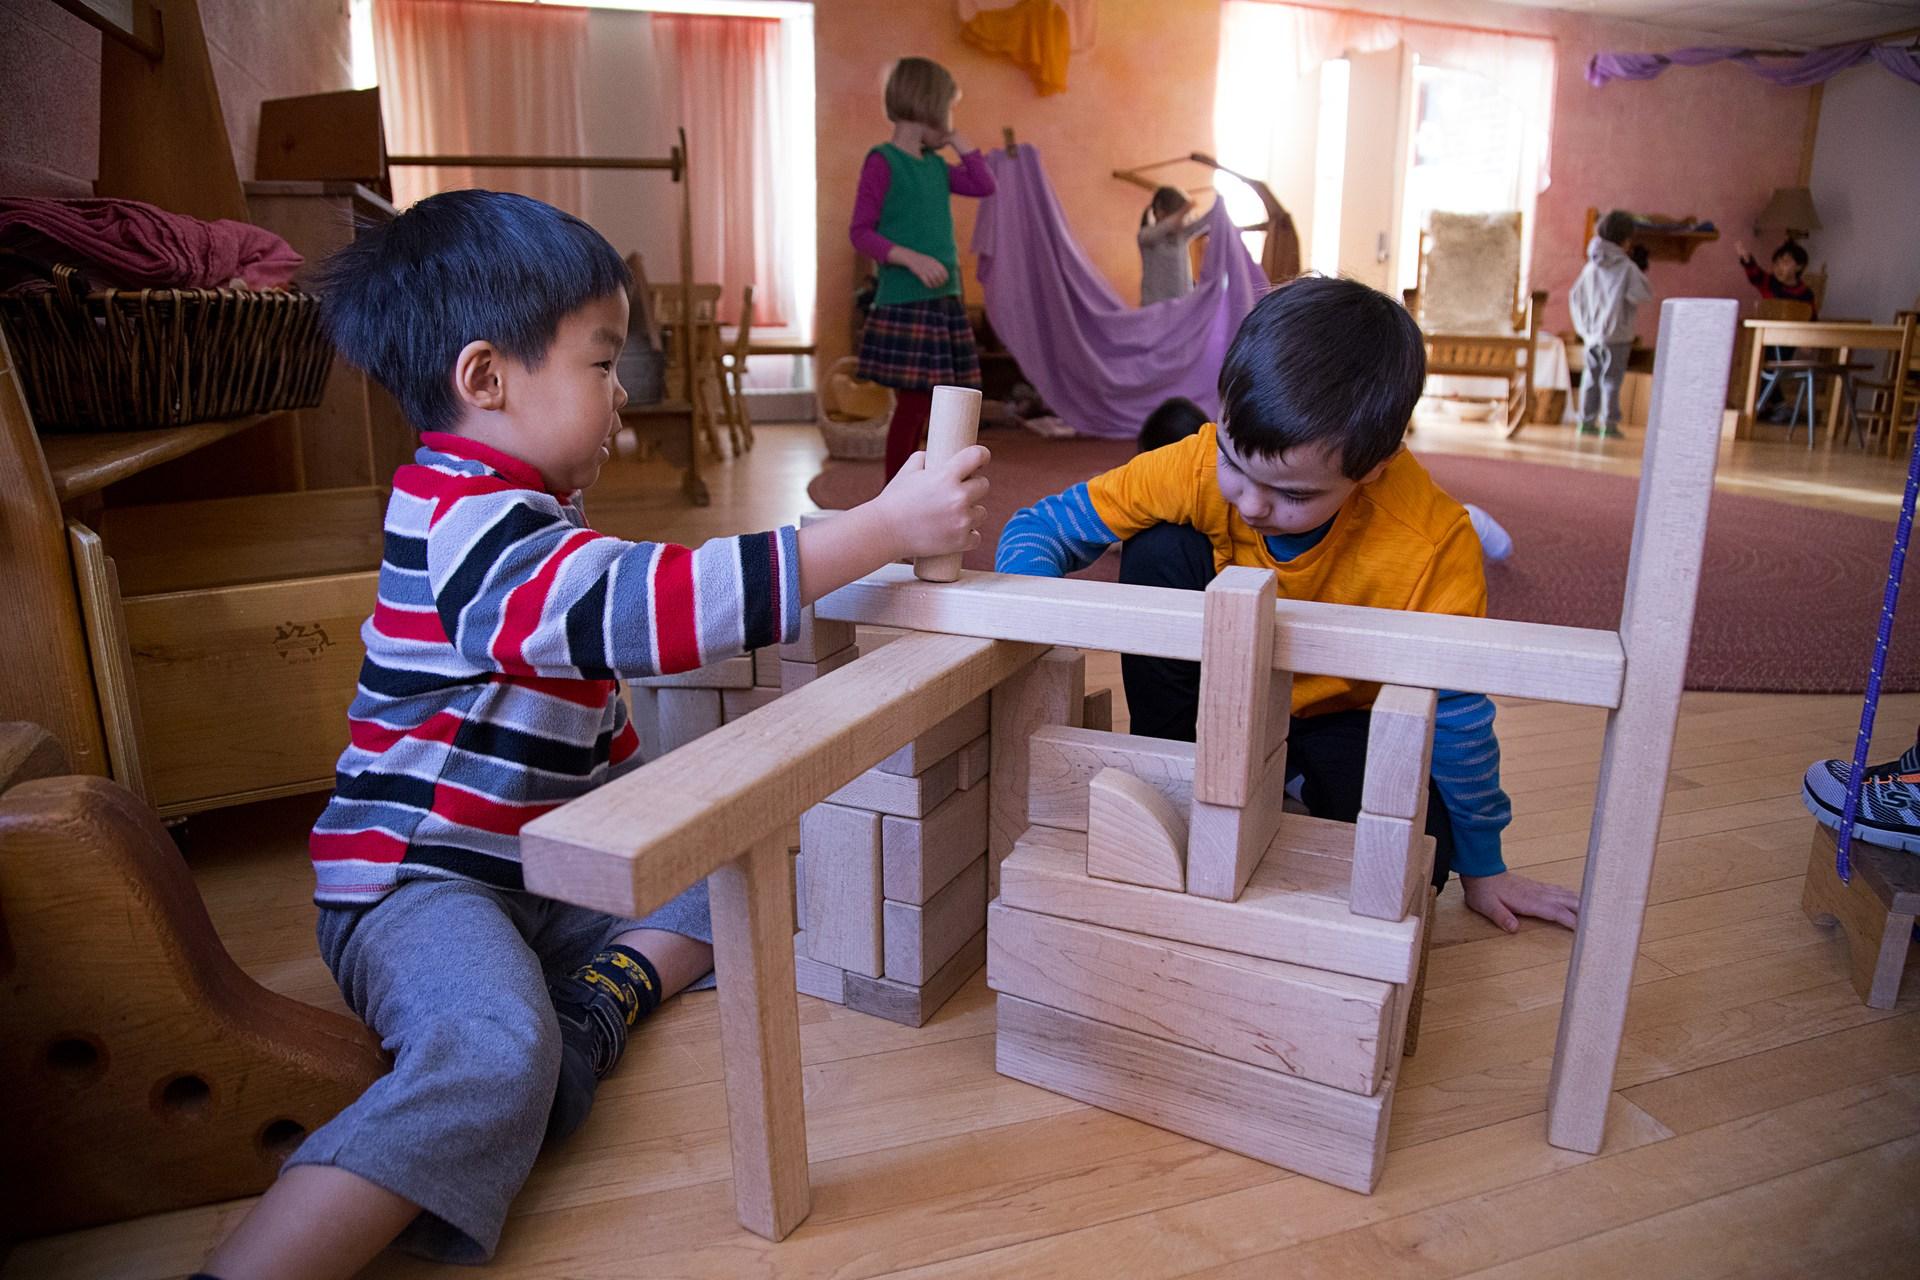 PreK boys playing with blocks